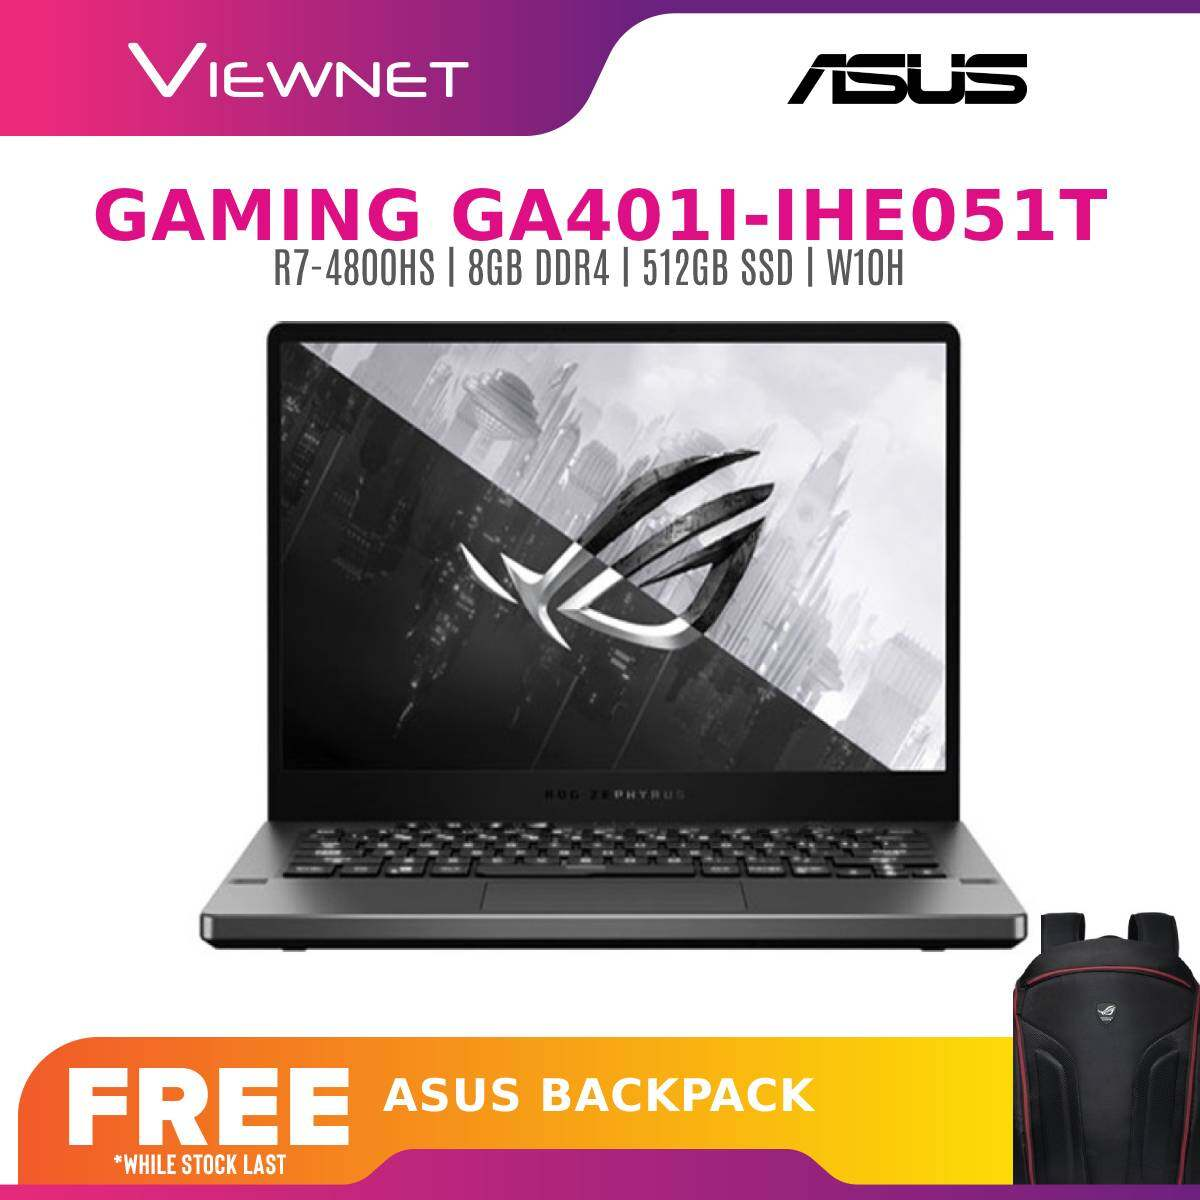 ASUS ZEPHYRUS G14 GA401I-IHE051T 14'' FHD 120HZ GAMING LAPTOP ( RYZEN 7 4800HS, 8GB, 512GB SSD, GTX1650TI 4GB, W10 )